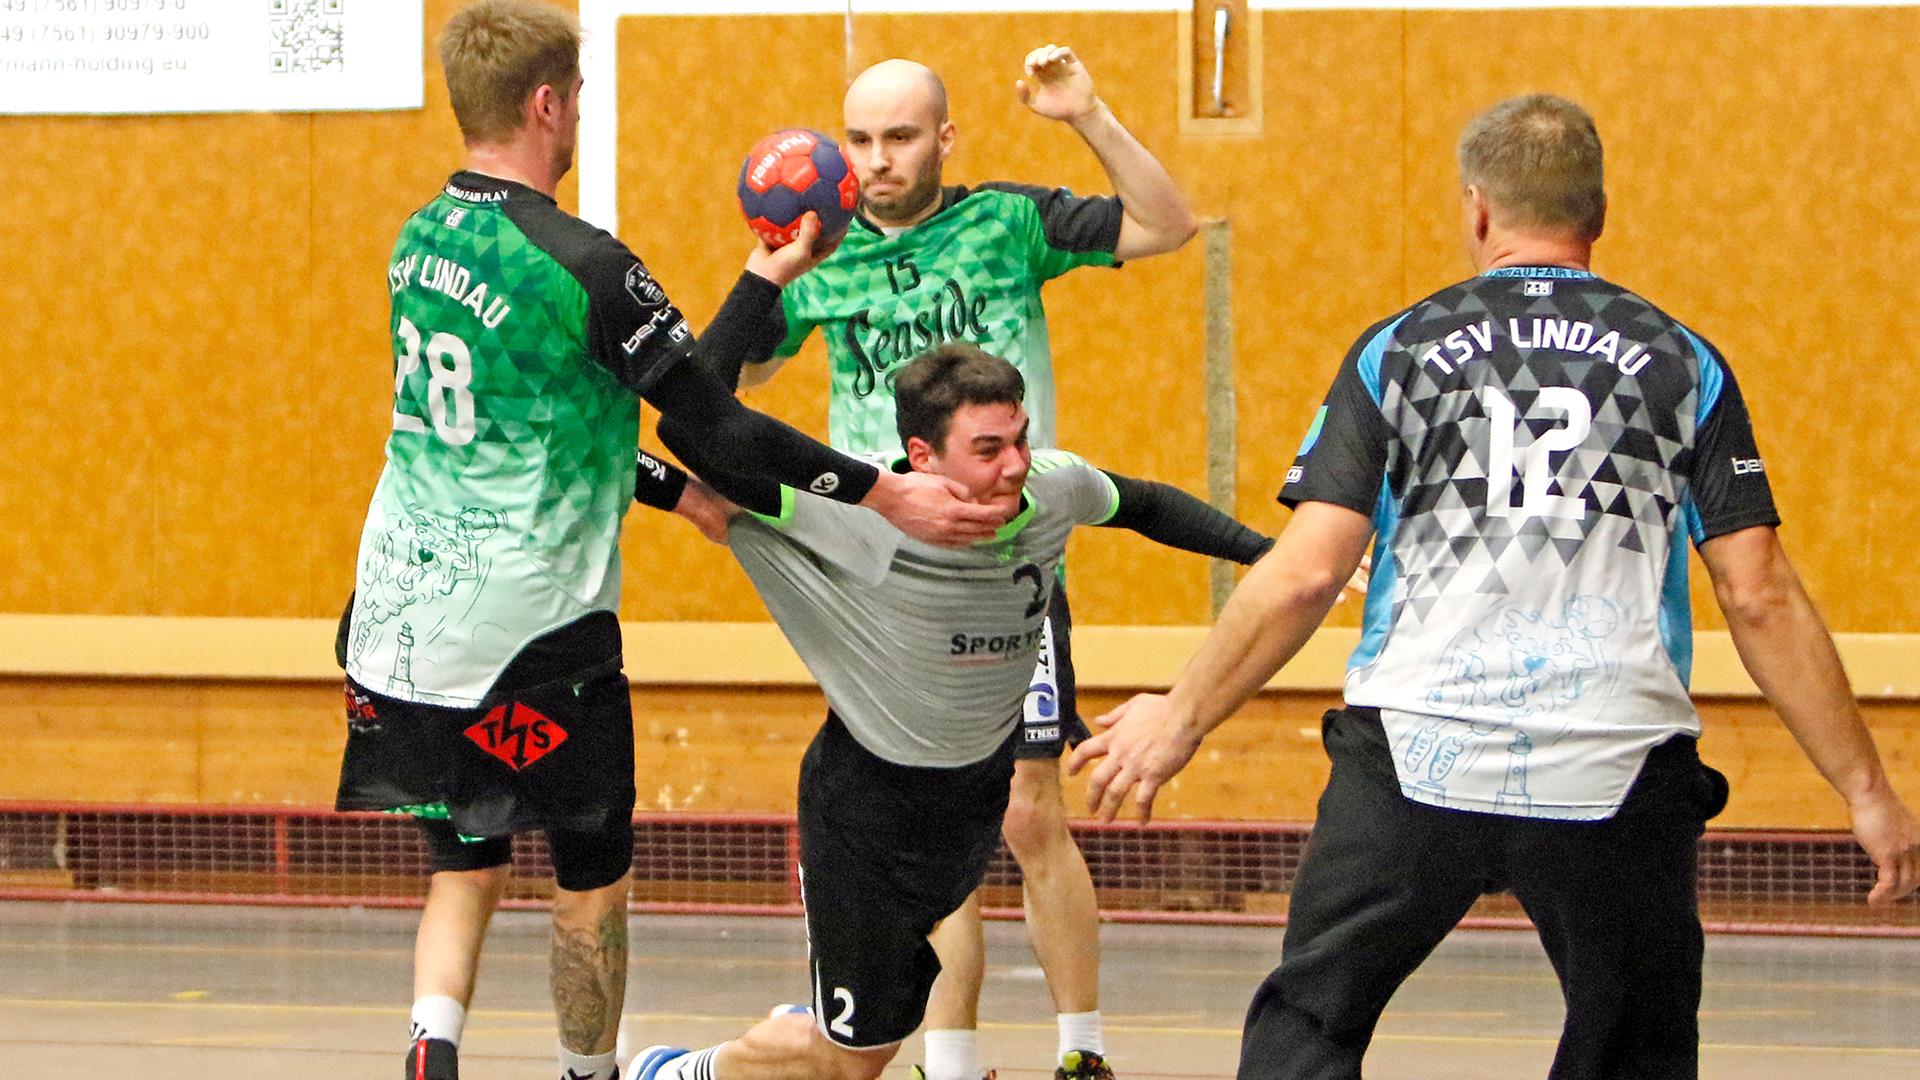 058Slider_Herren1_tsg_leutkirch_handball